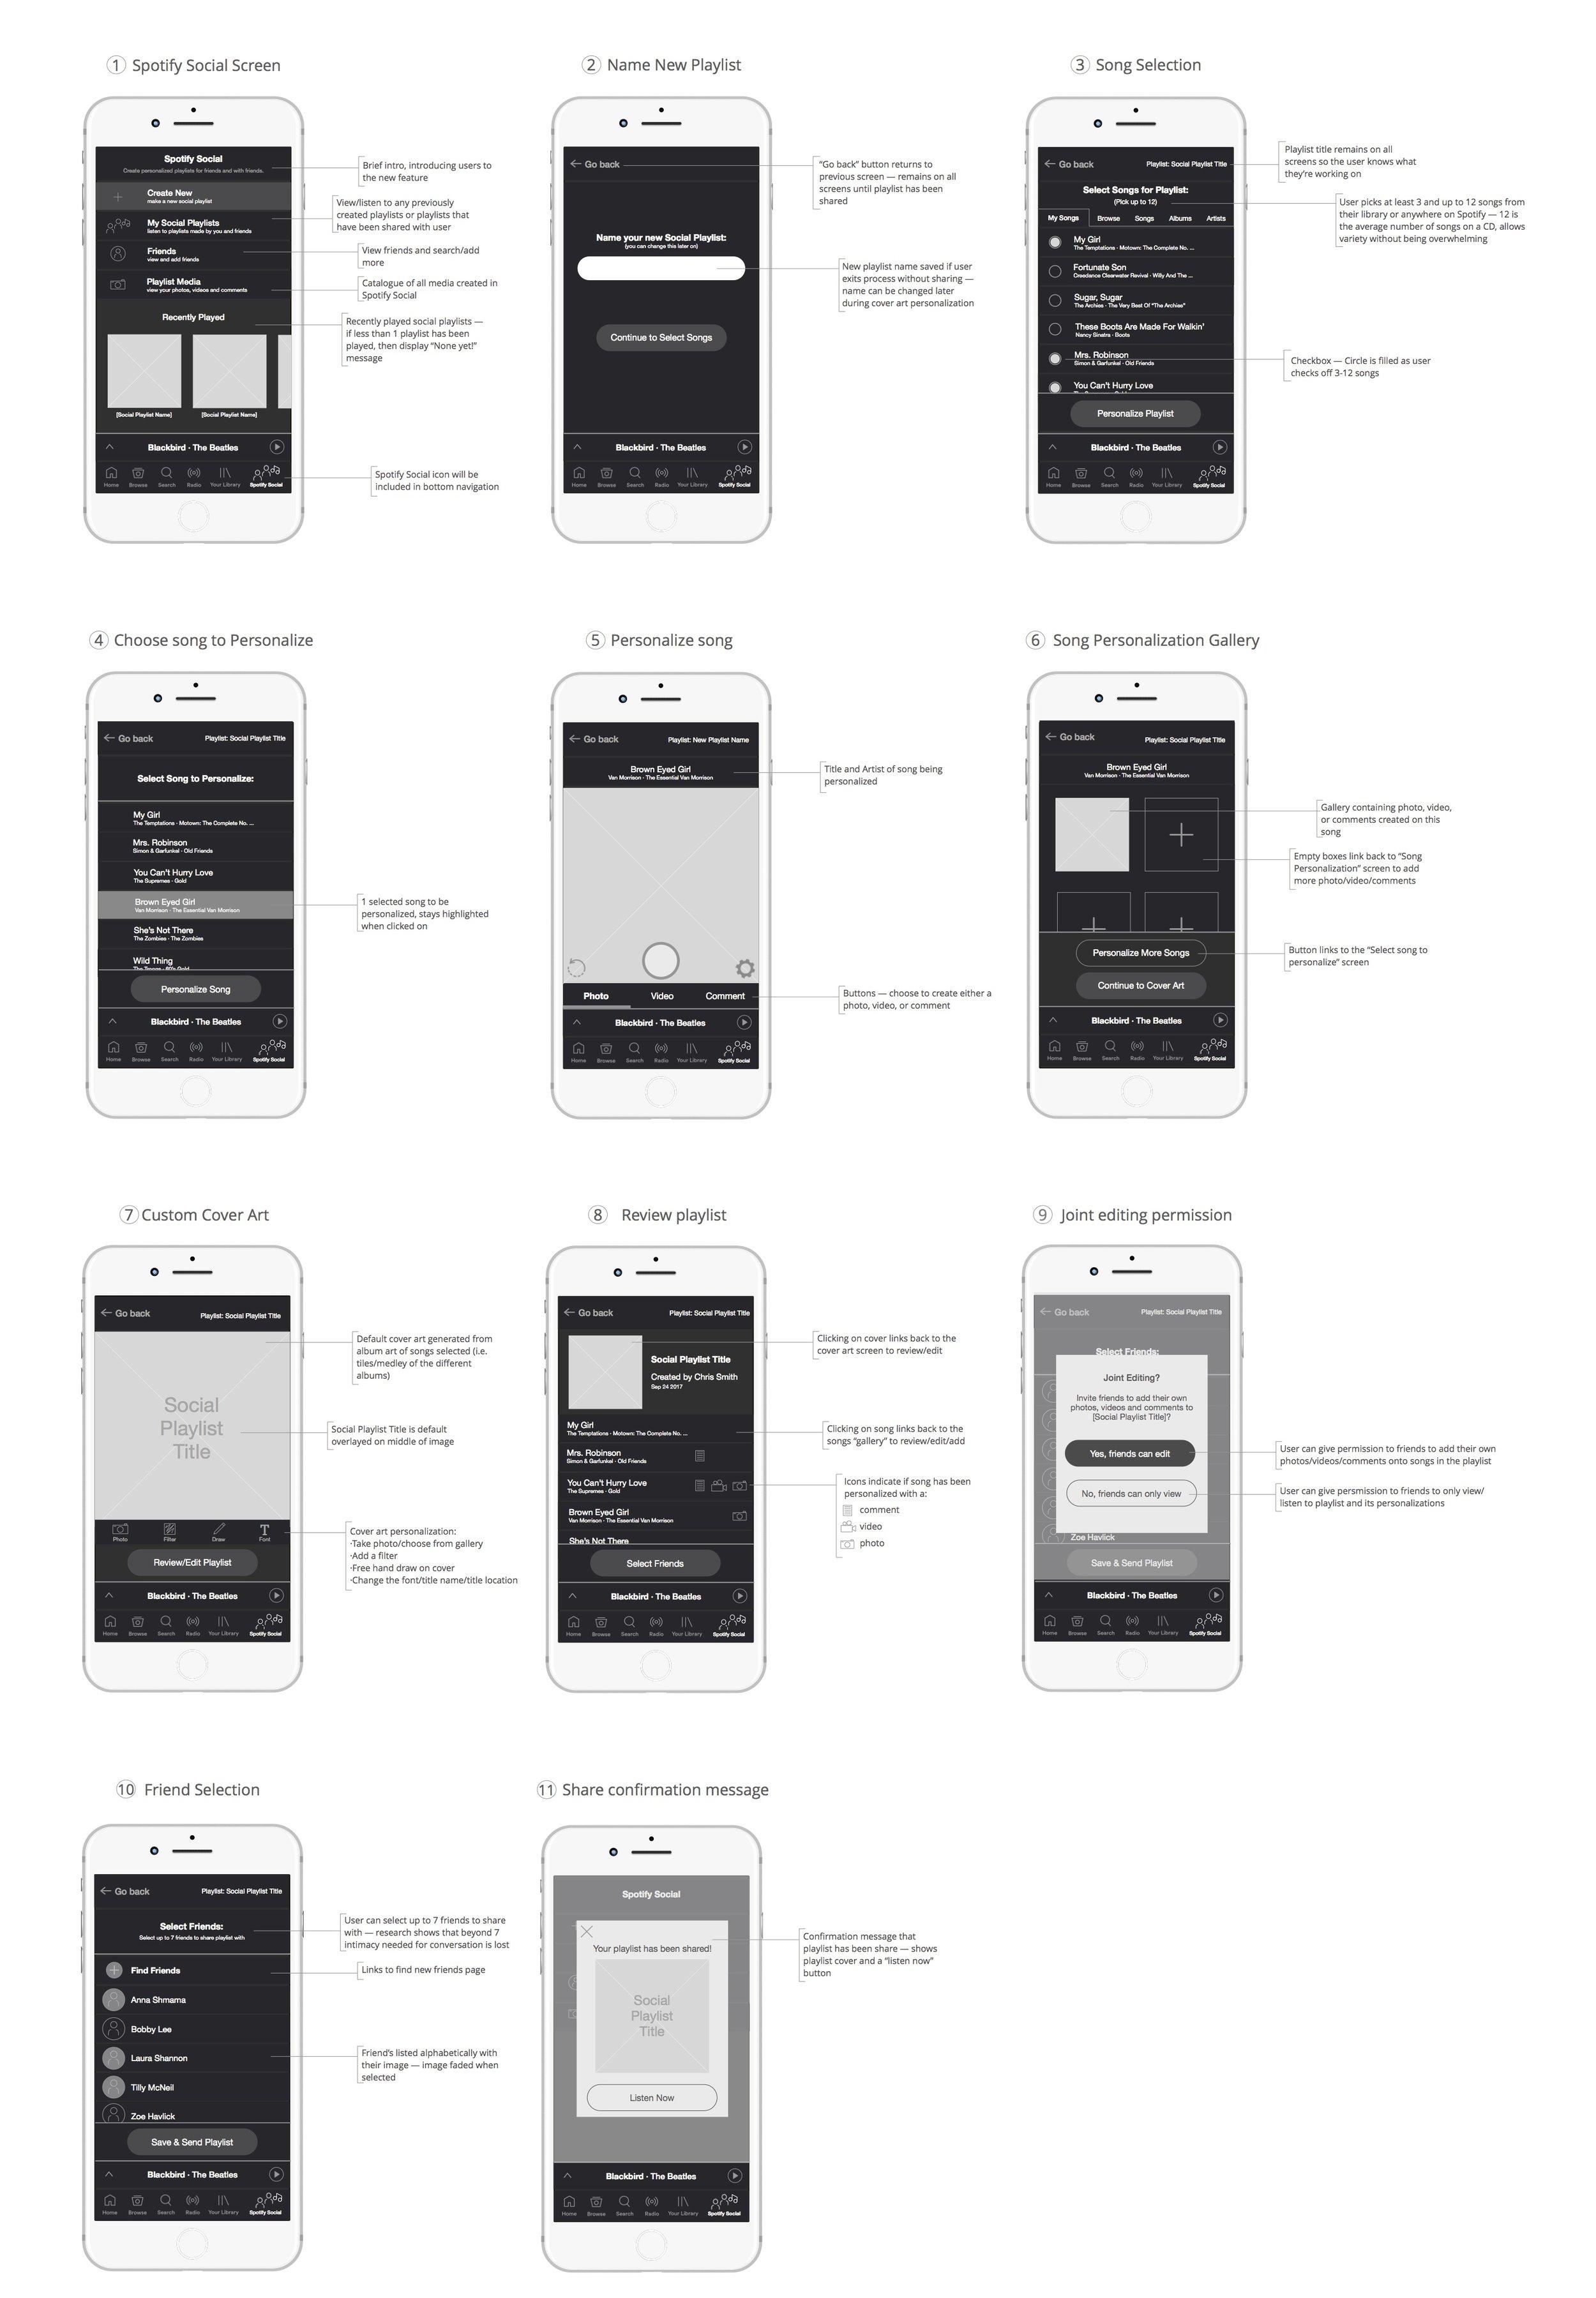 midfedwireframs-spotify social-annotated copy.jpg